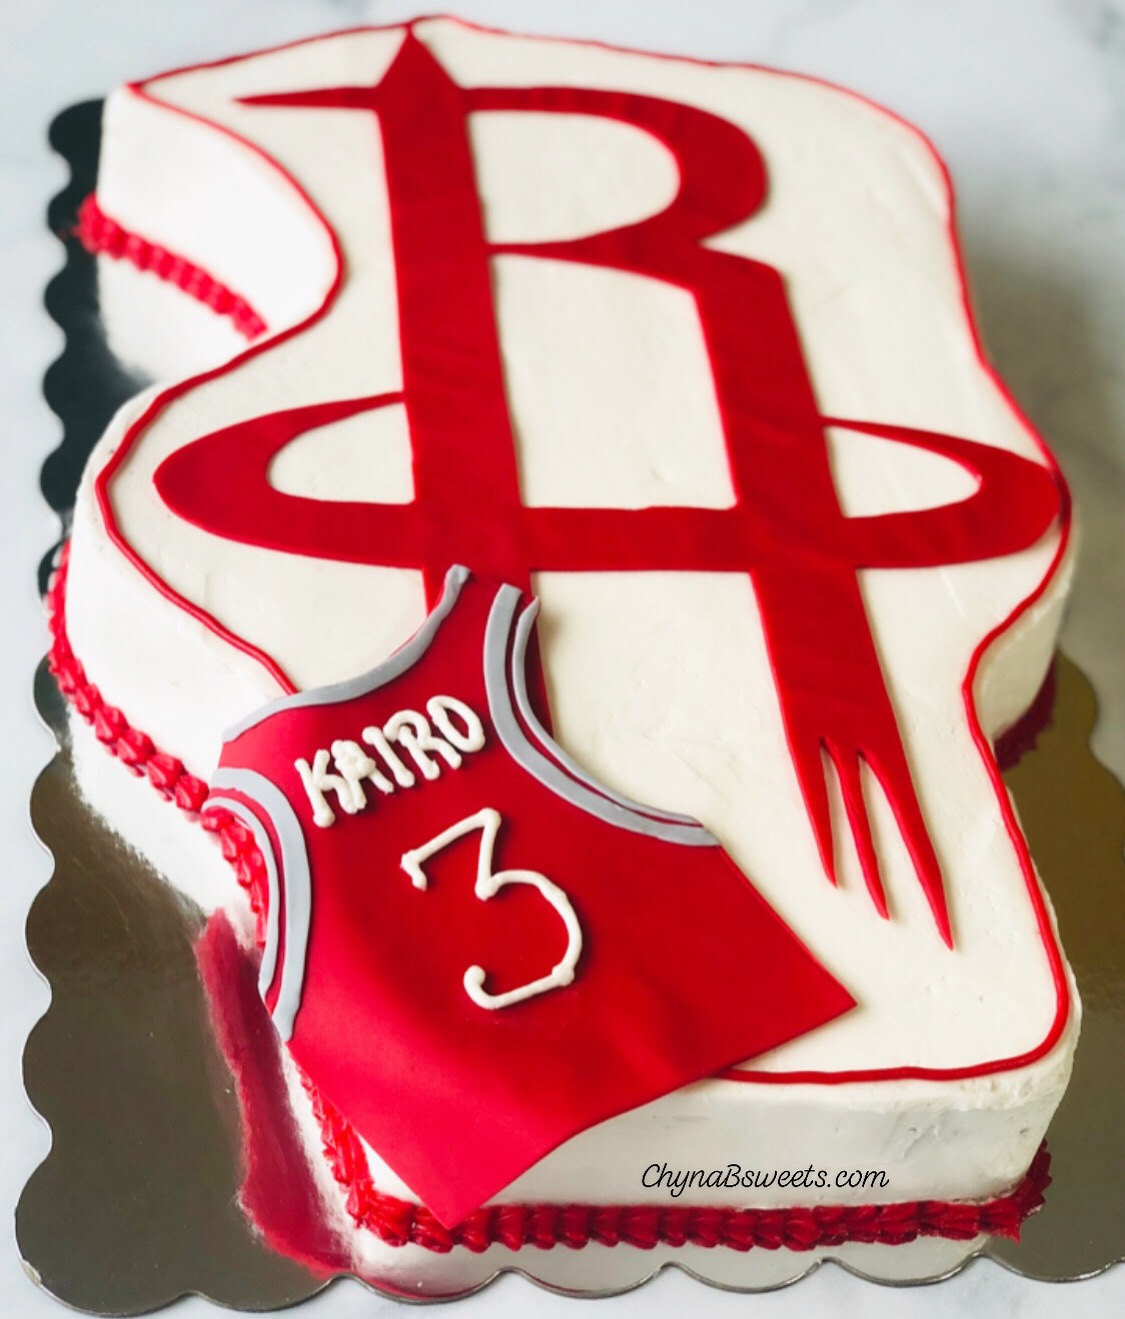 Houston Rockets!